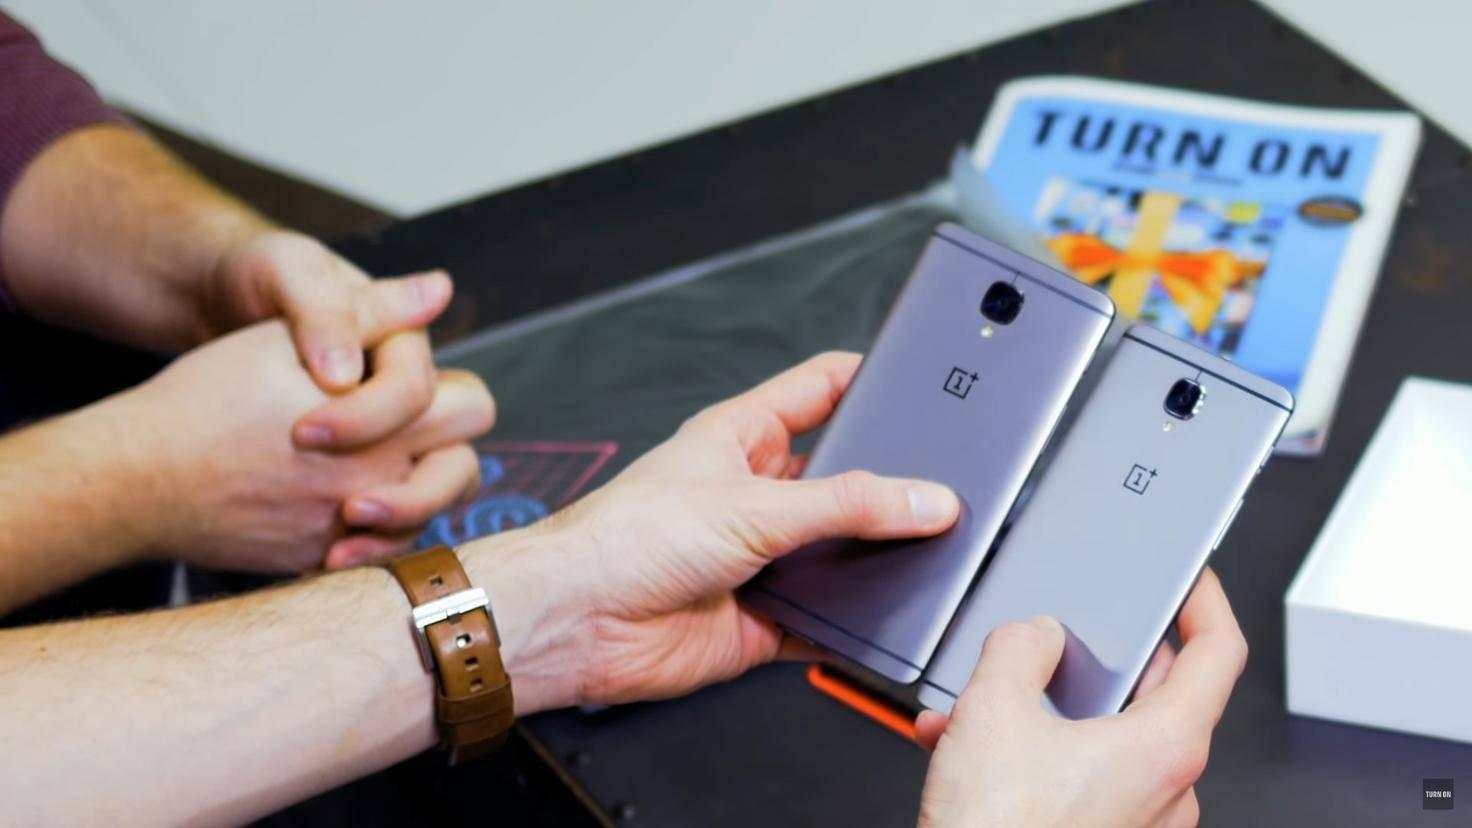 OnePlus 3 OnePlus 3T Turn On